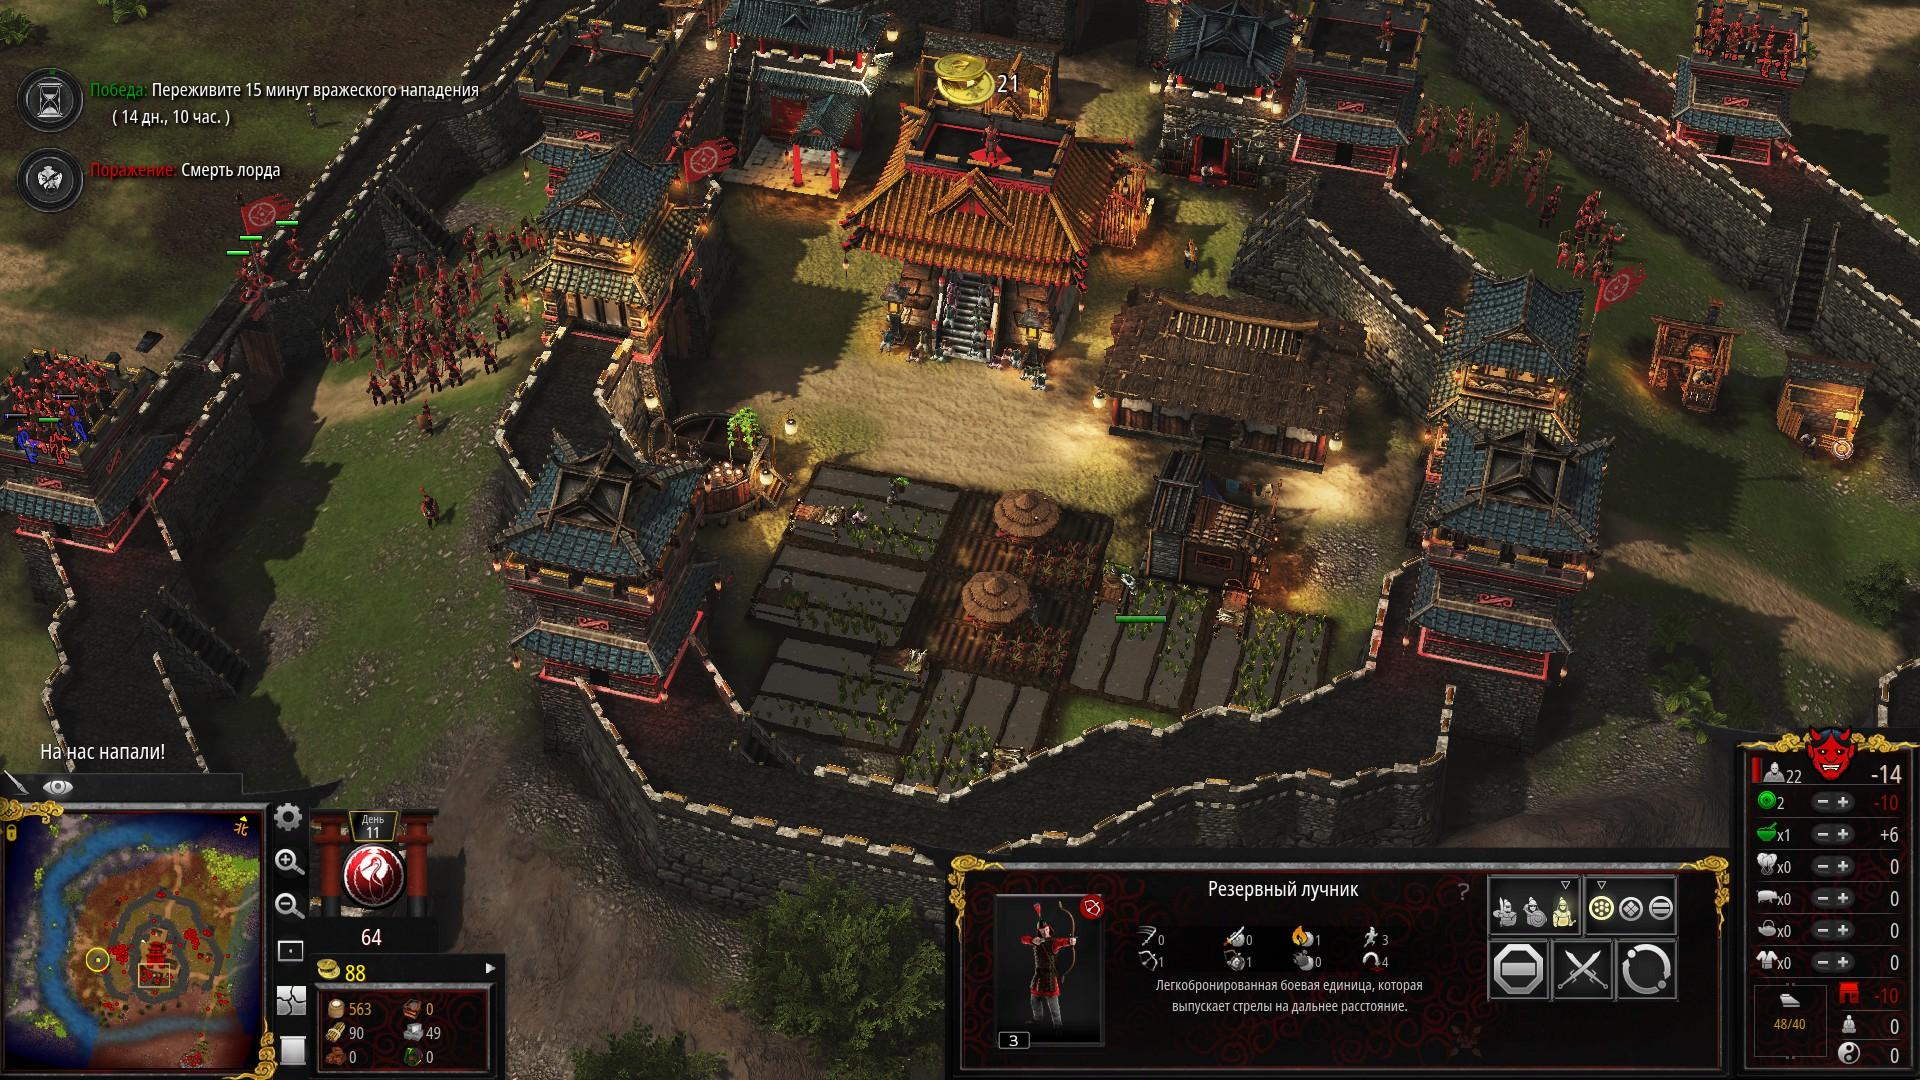 Stronghold: Warlords — замок несбывшихся надежд. Рецензия